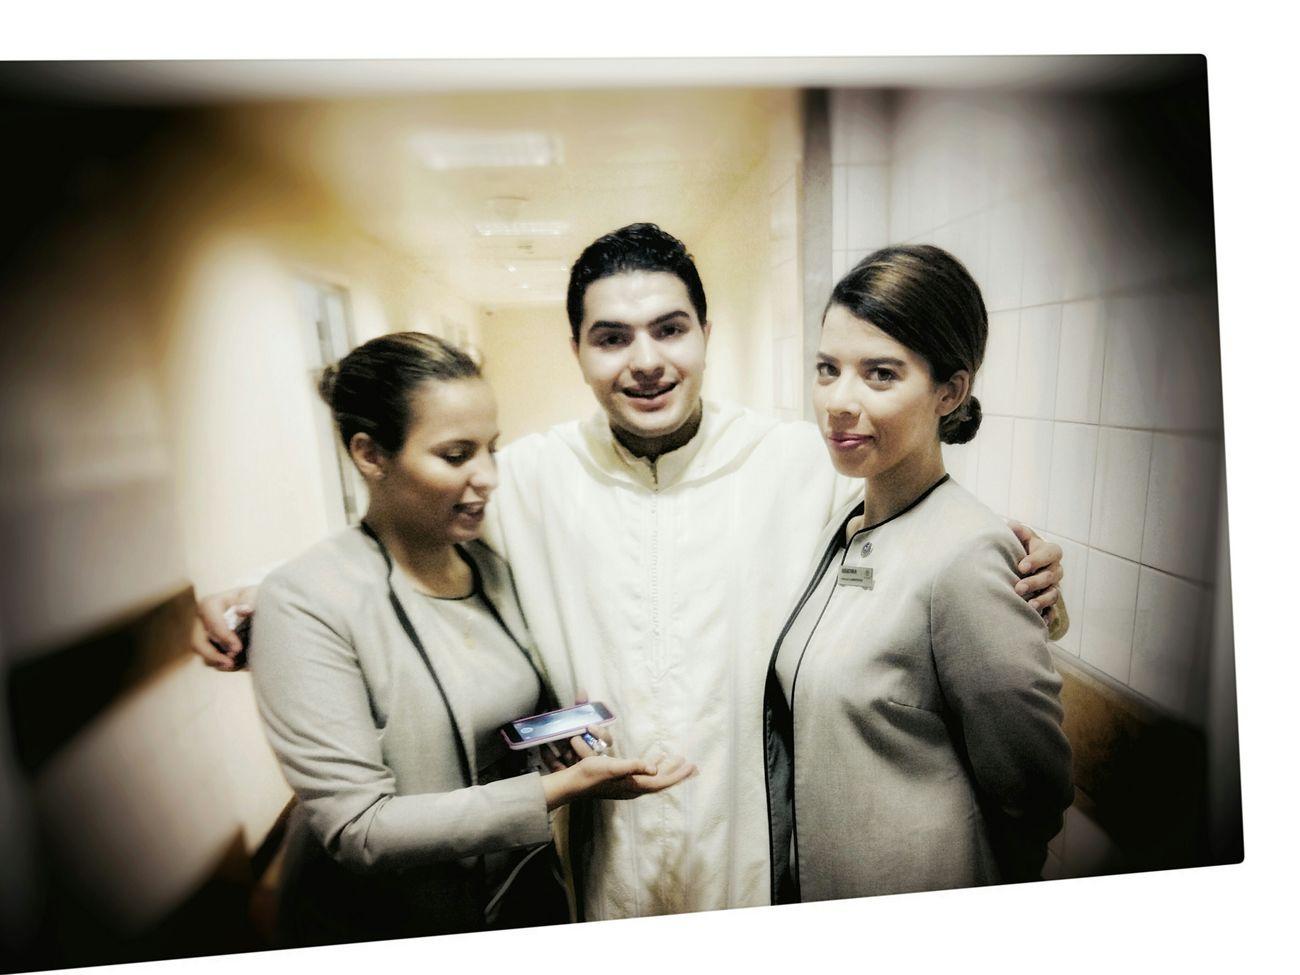 Eidinqatar Booking A Room Ramadan Kareem Eid Mubarak